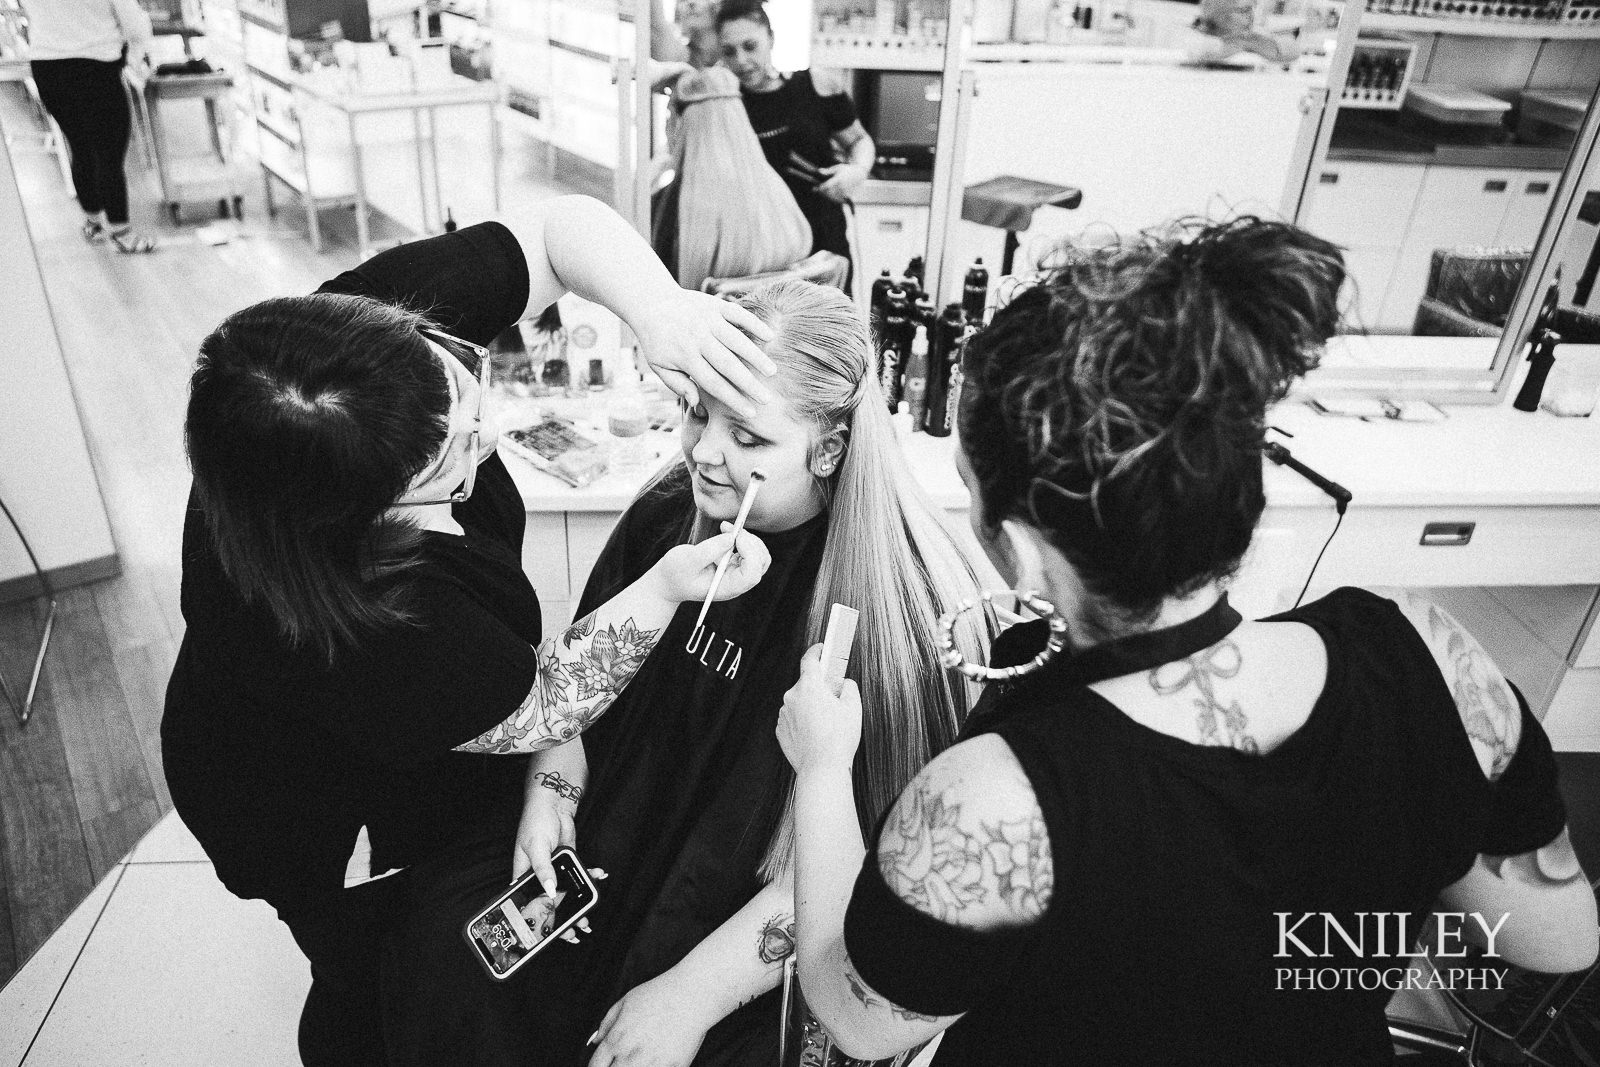 006 - Ulta Beauty Wedding Hair and Makeup - Rochester NY - IMG_6750.jpg